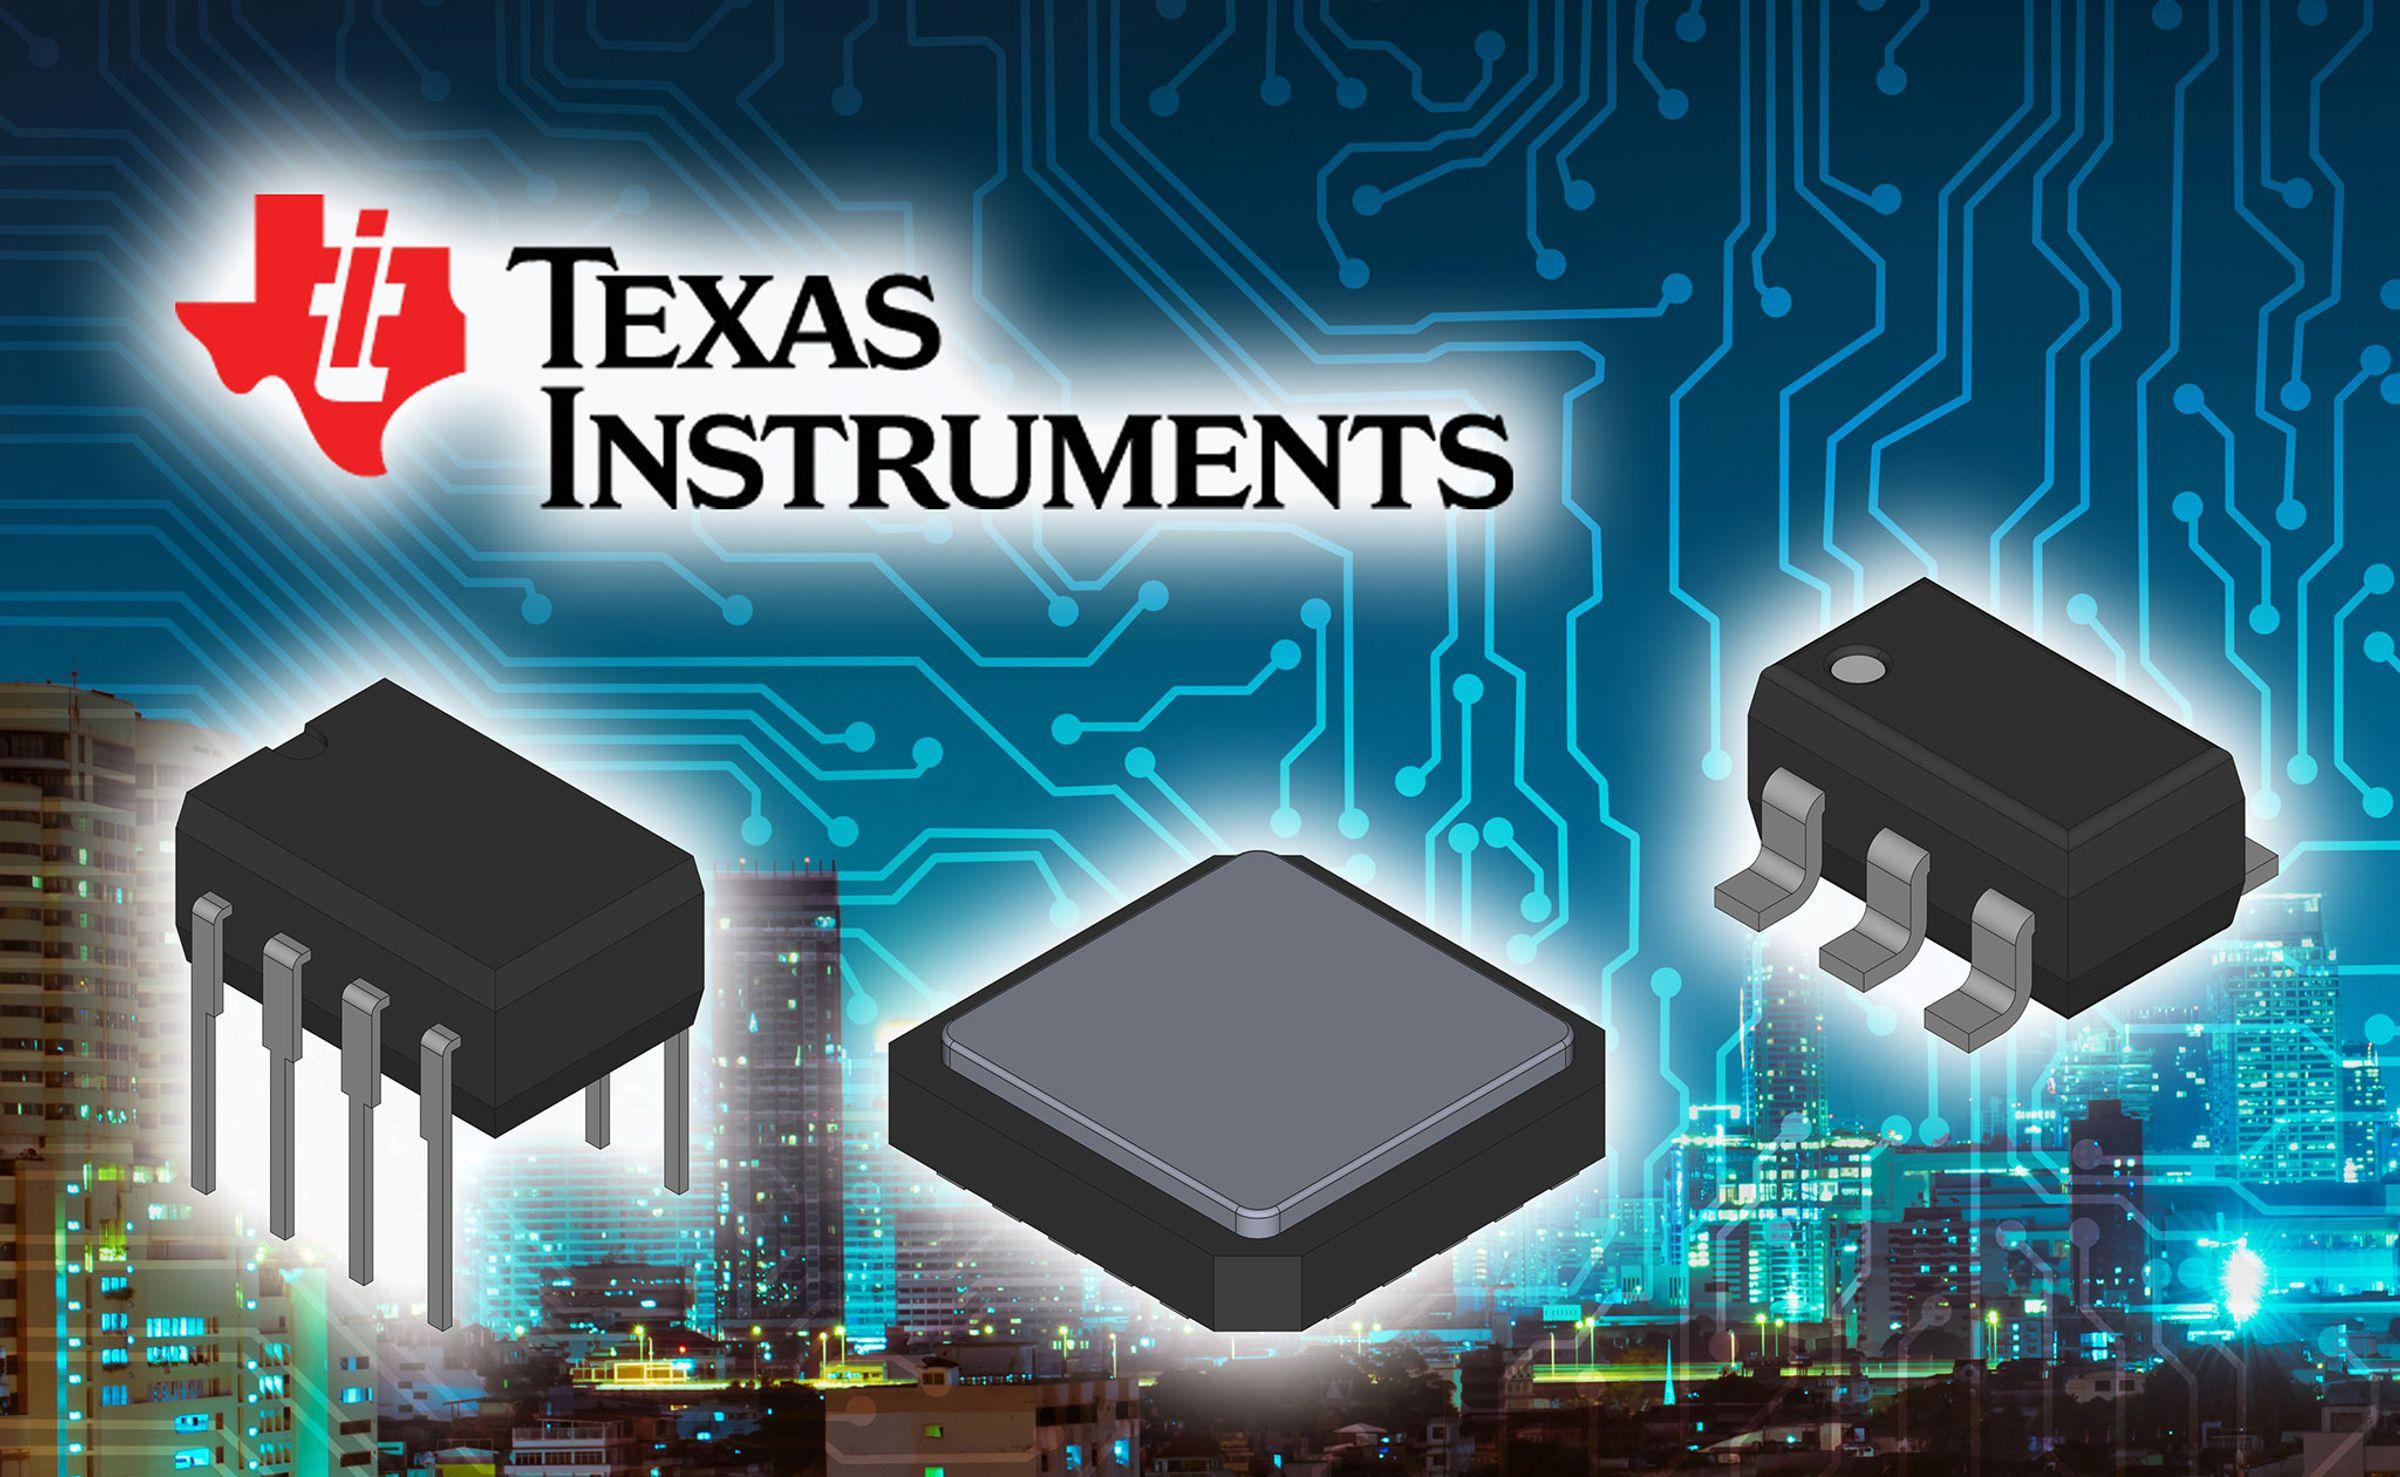 Texas-Instruments-gen-announcement-Email_JUL19